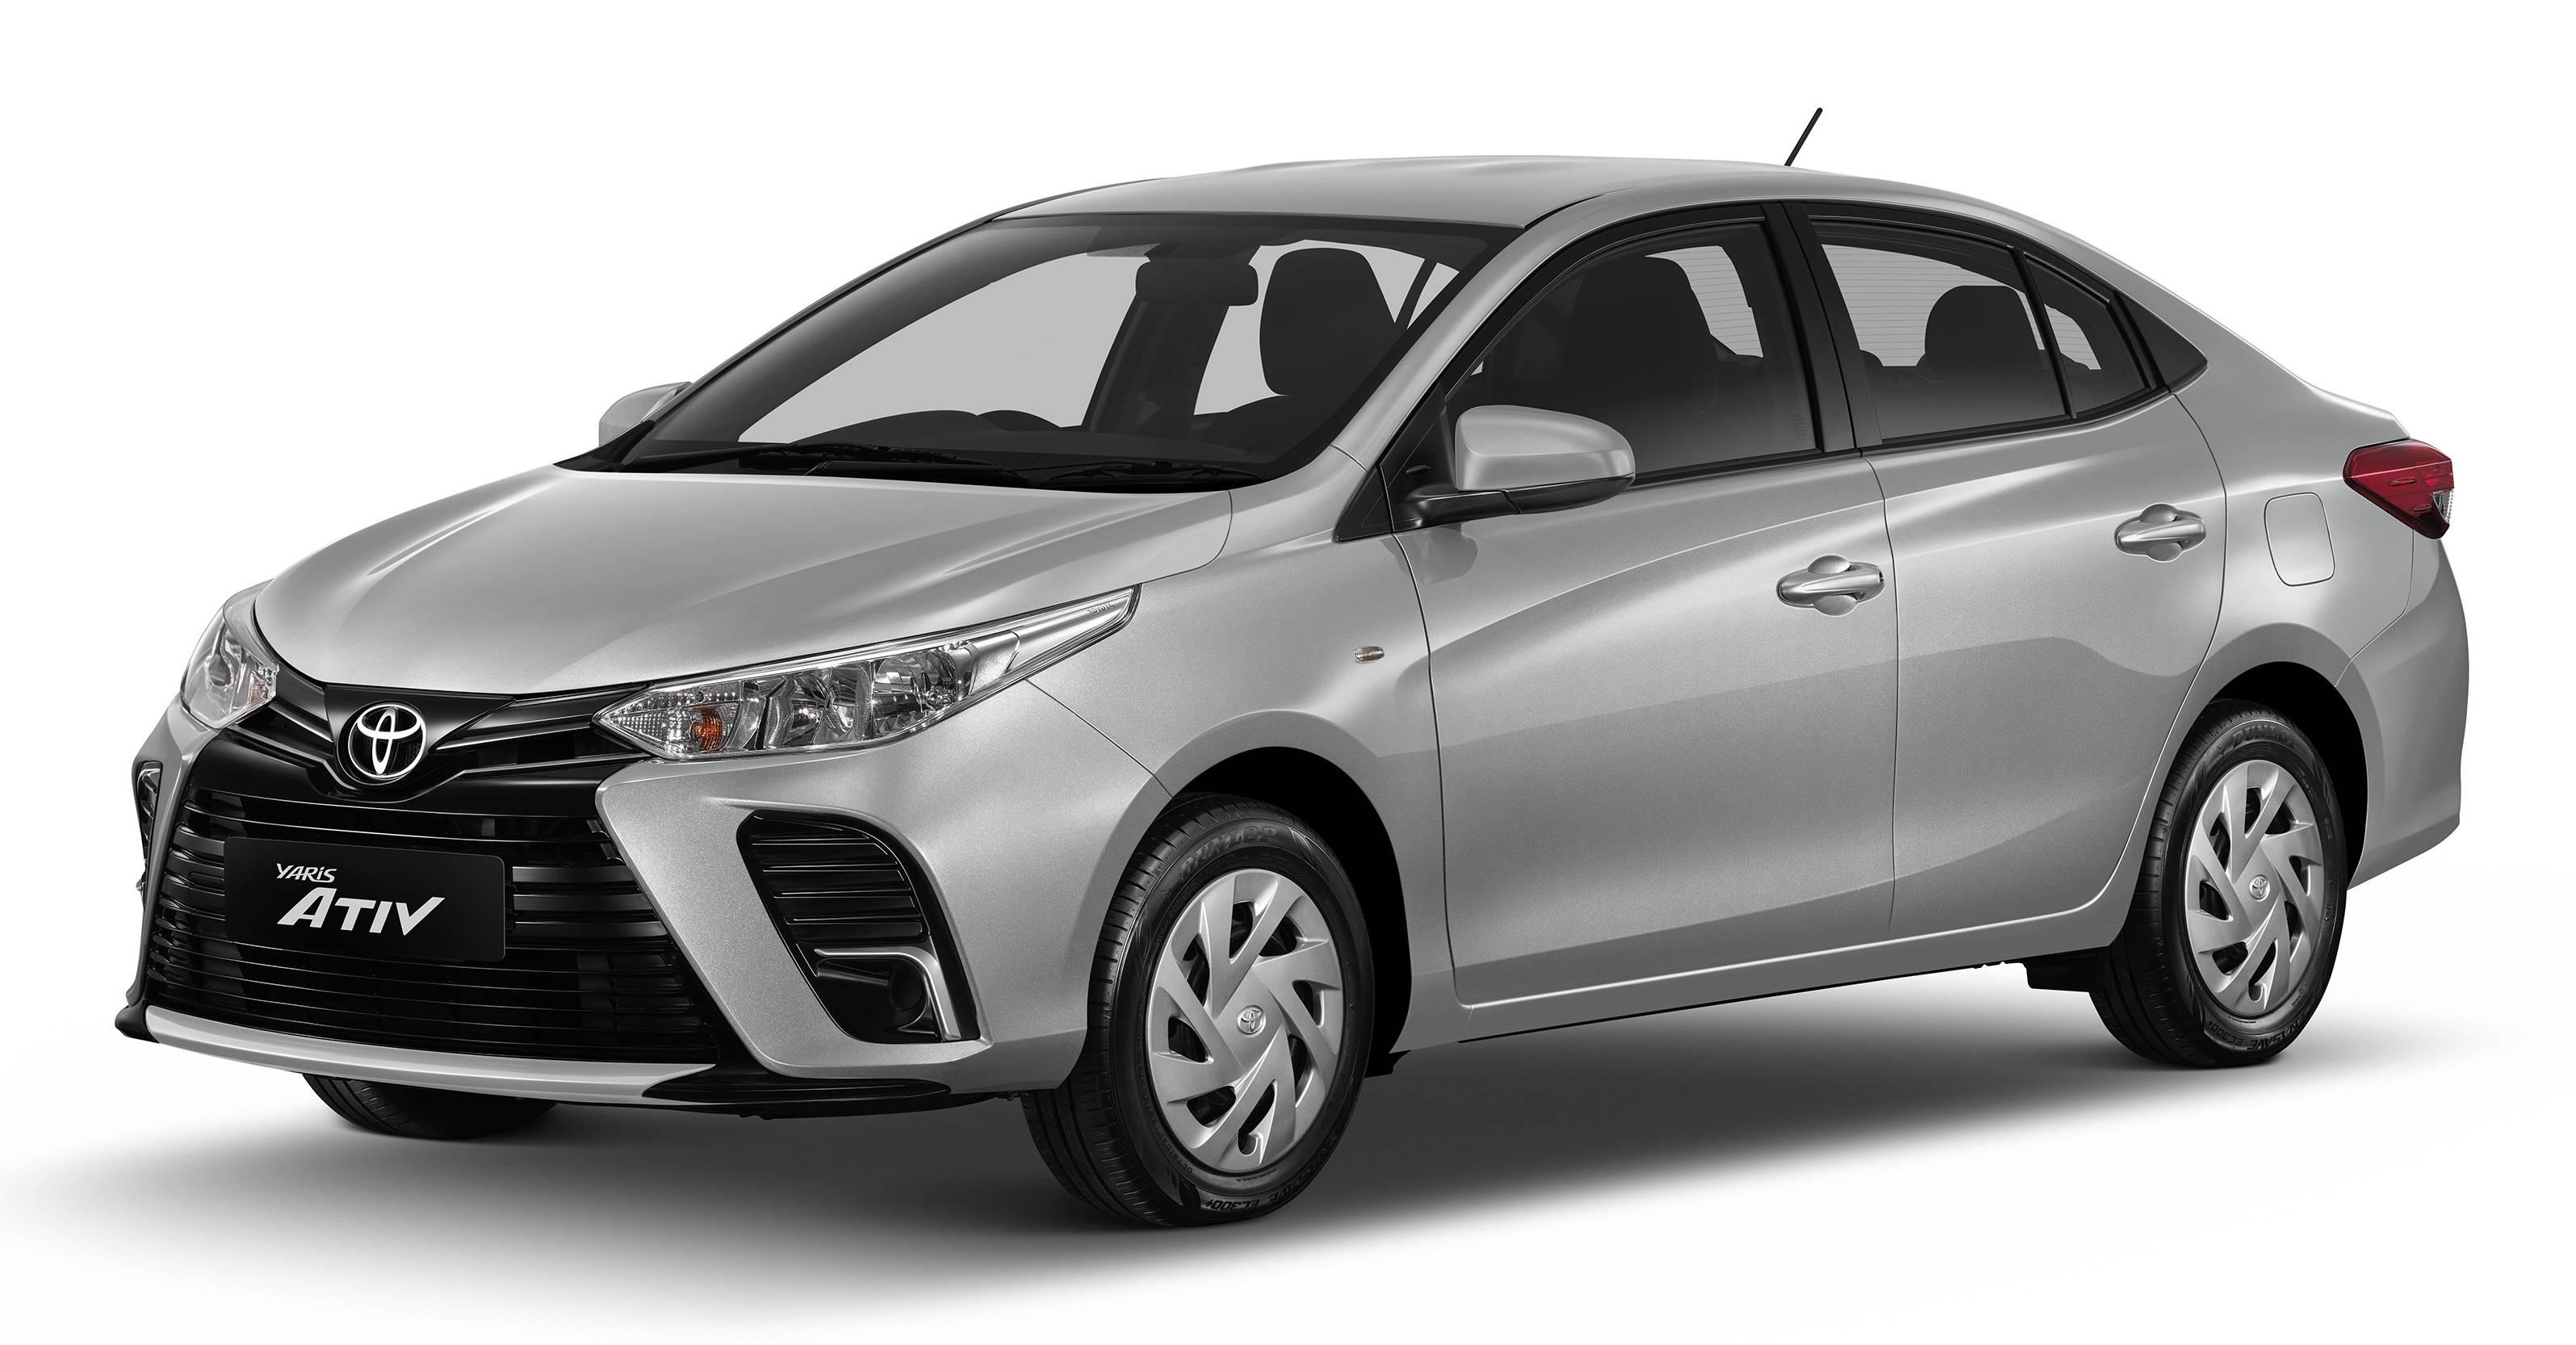 2022 Toyota Yaris Ativ Thailand-23